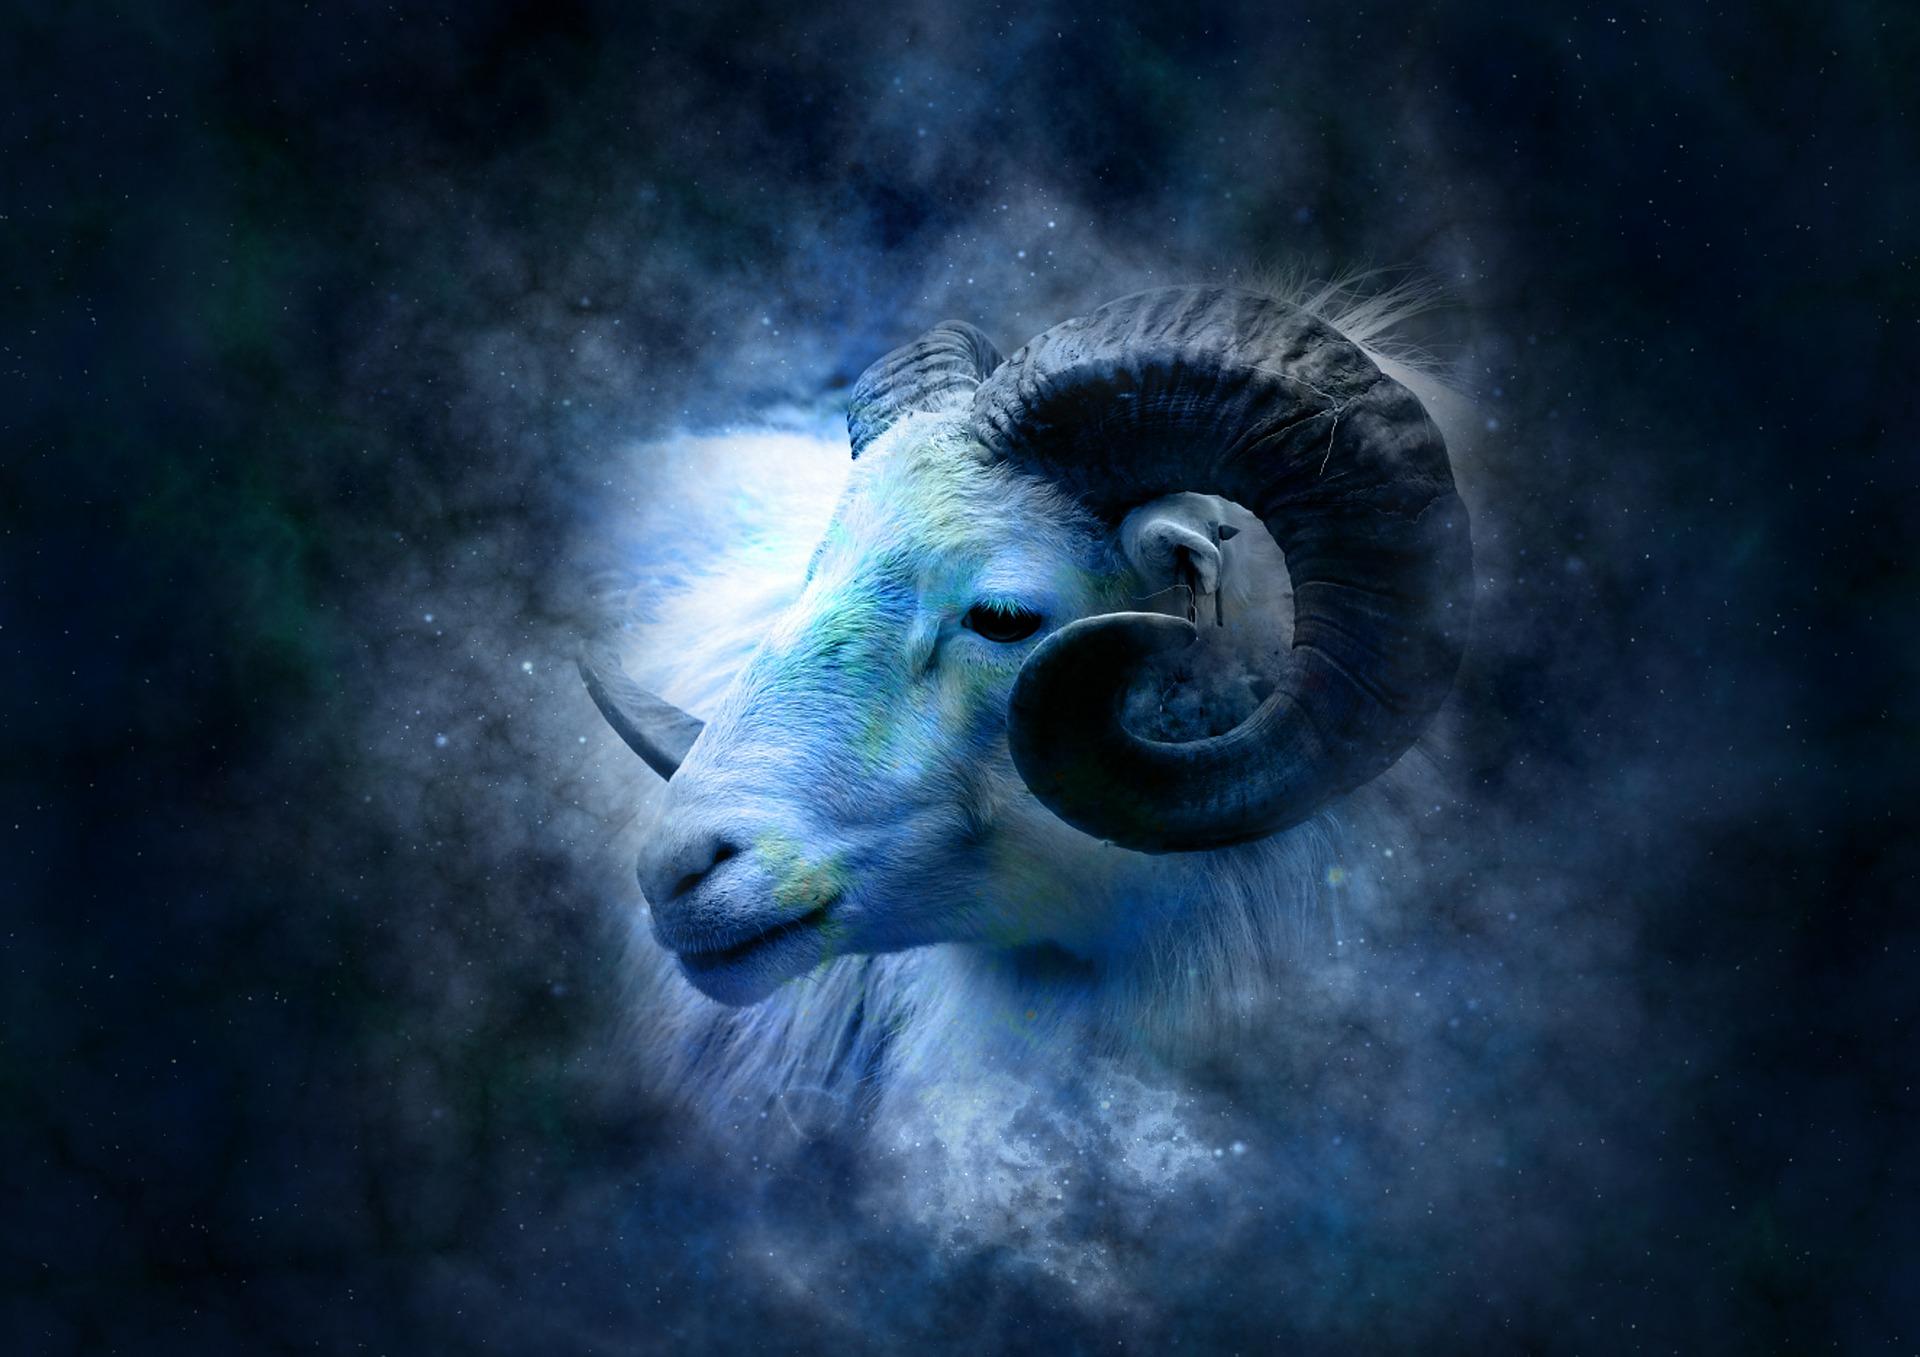 Horoscop săptămânal Minerva 7-13 septembrie 2020 - Berbec